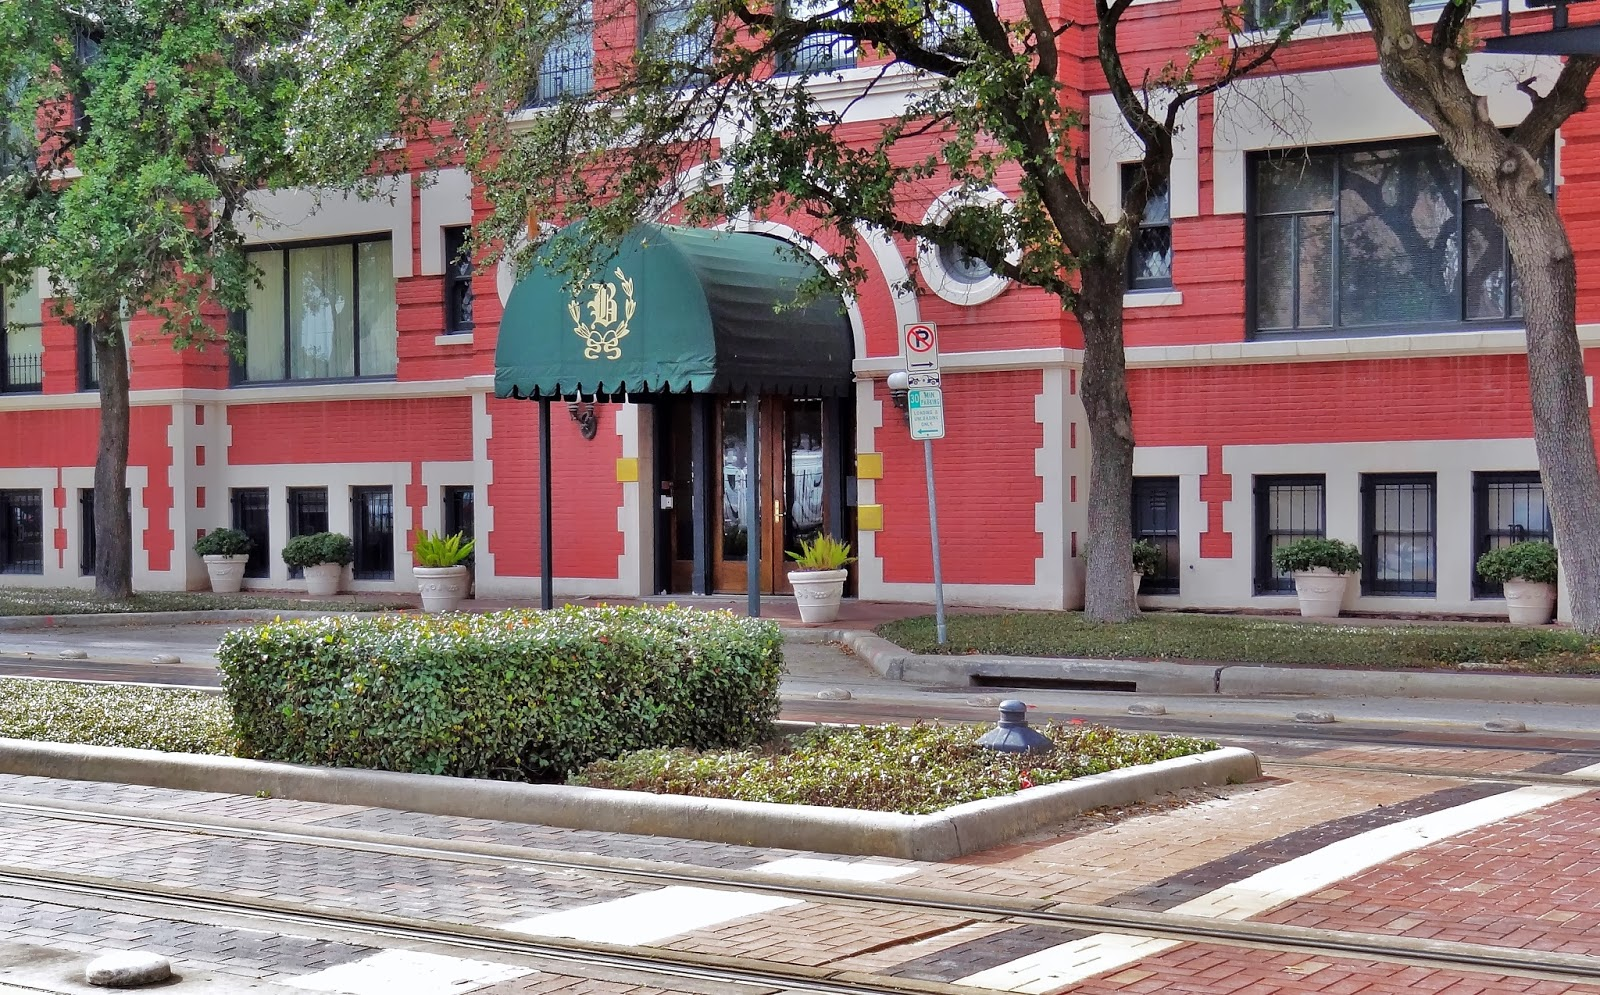 The Beaconsfield 1700 Main Street, Houston, Texas, Downtown 77002